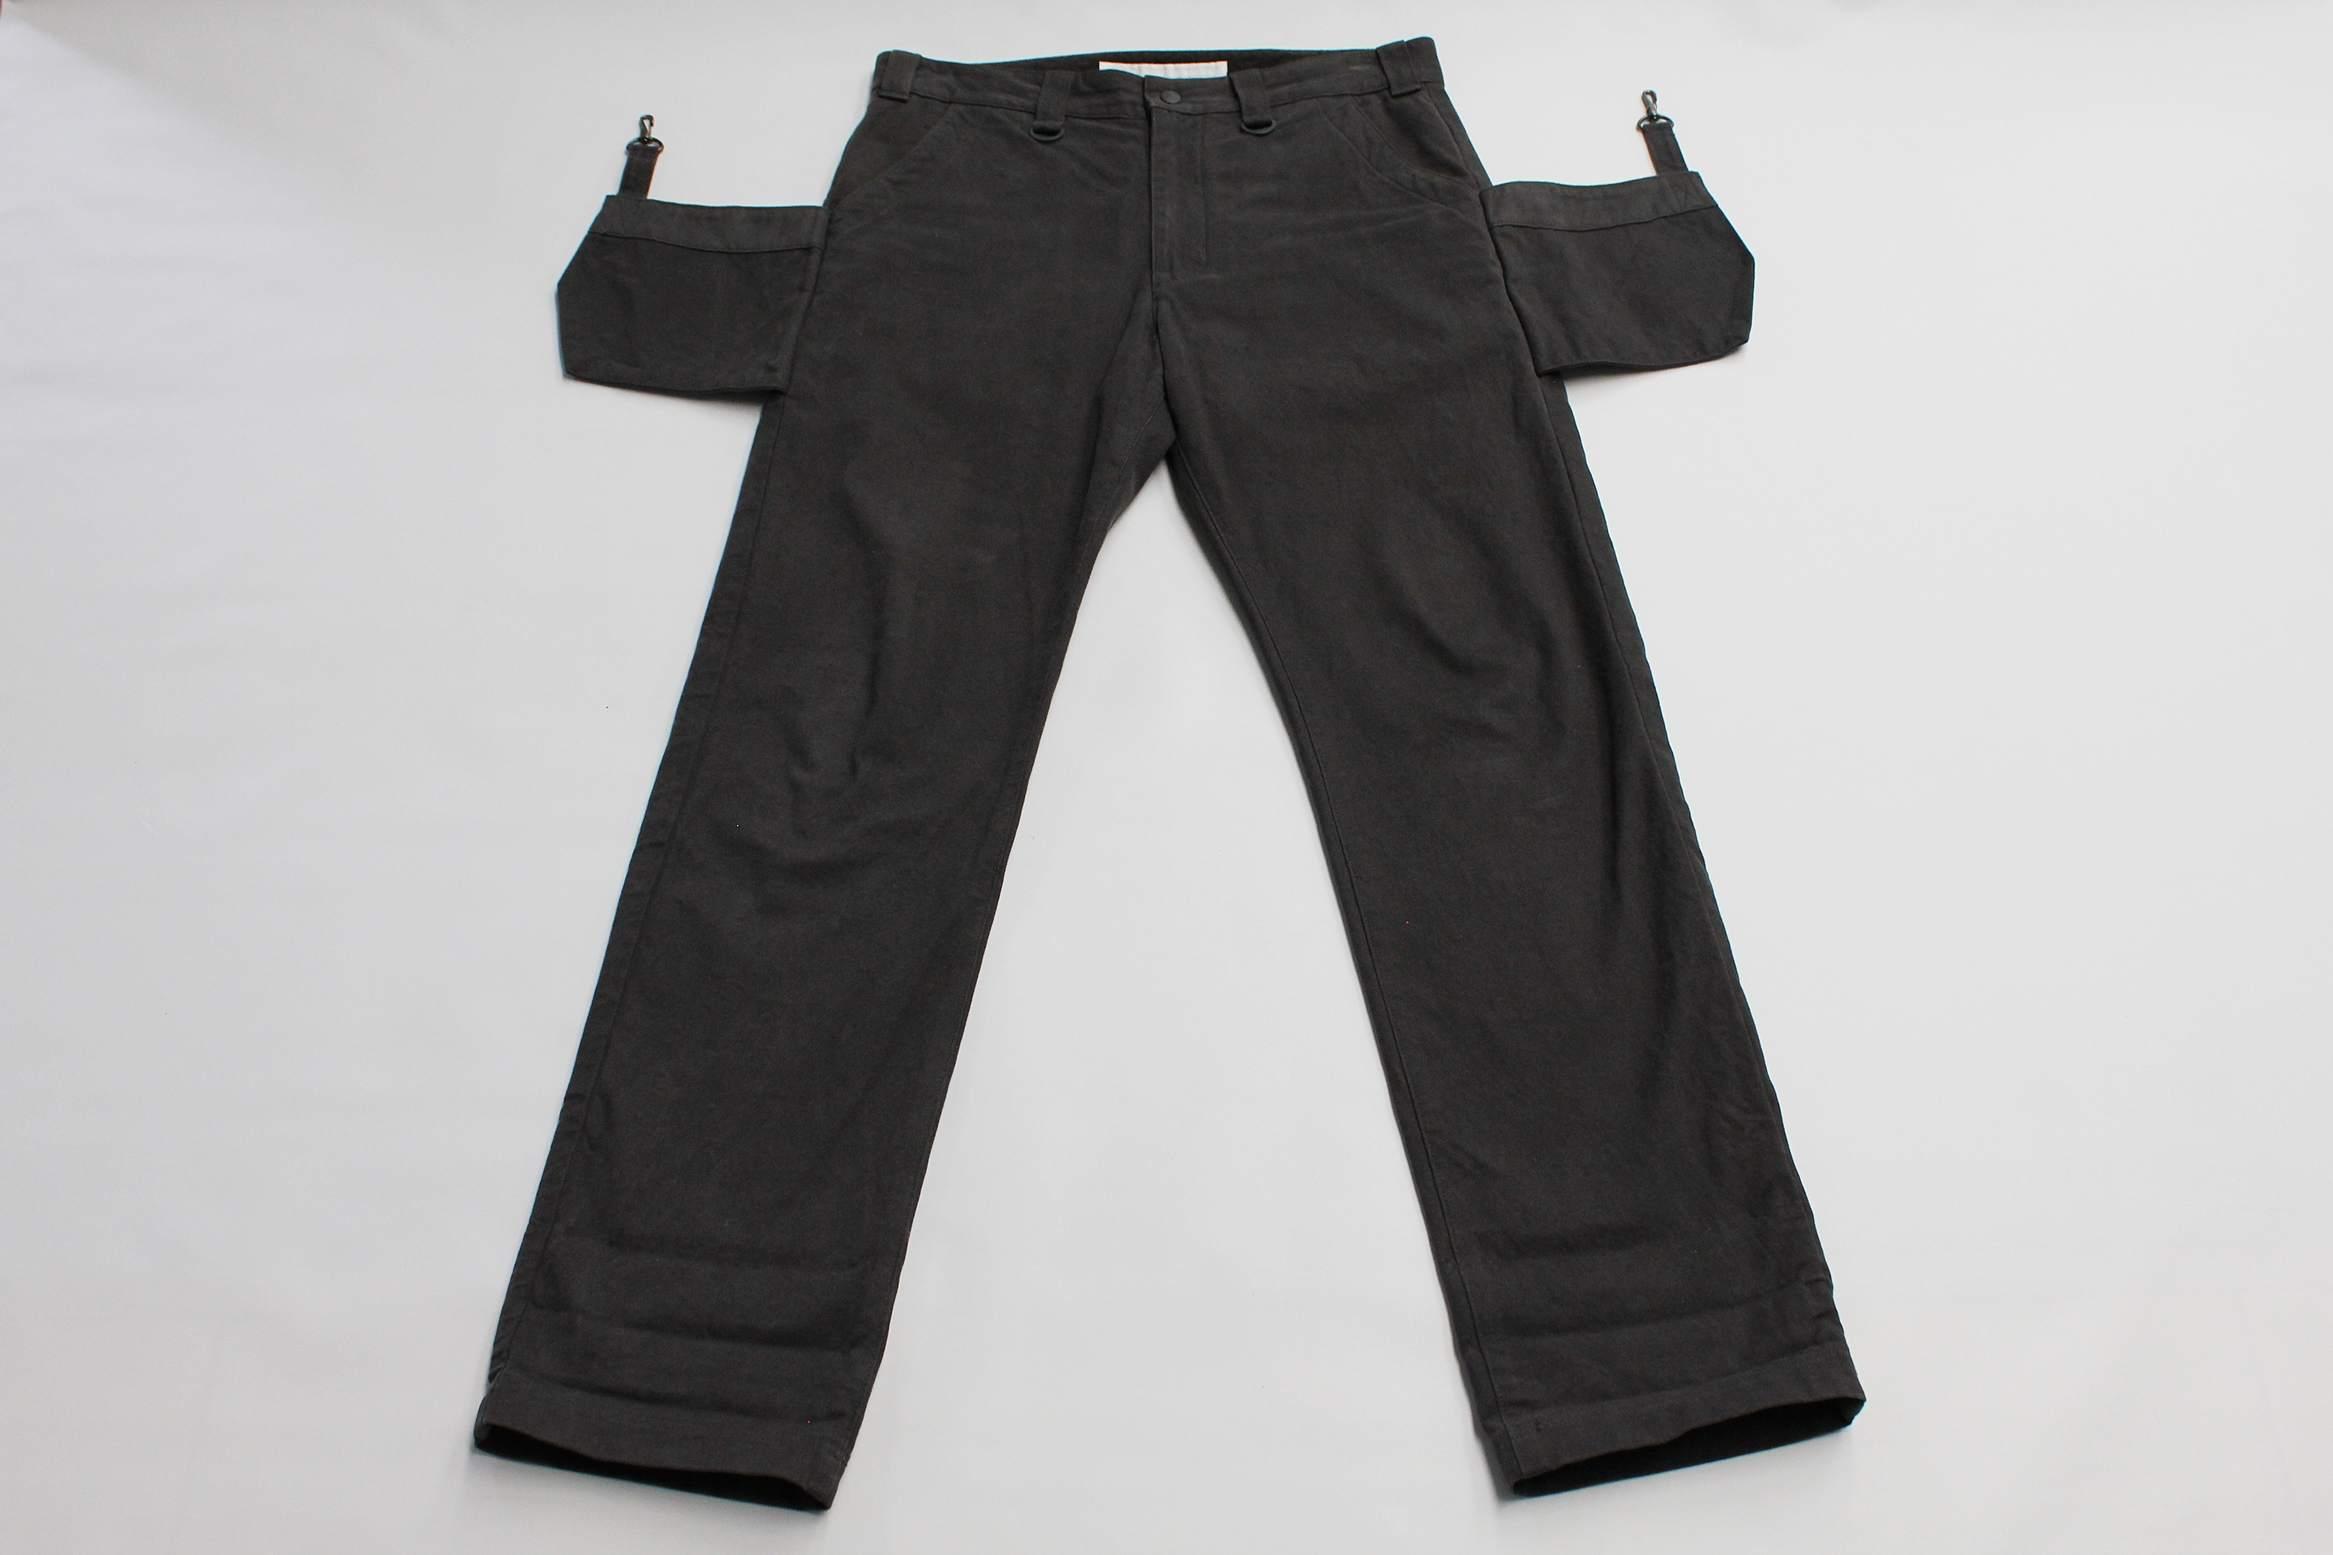 White Mountaineering Pants